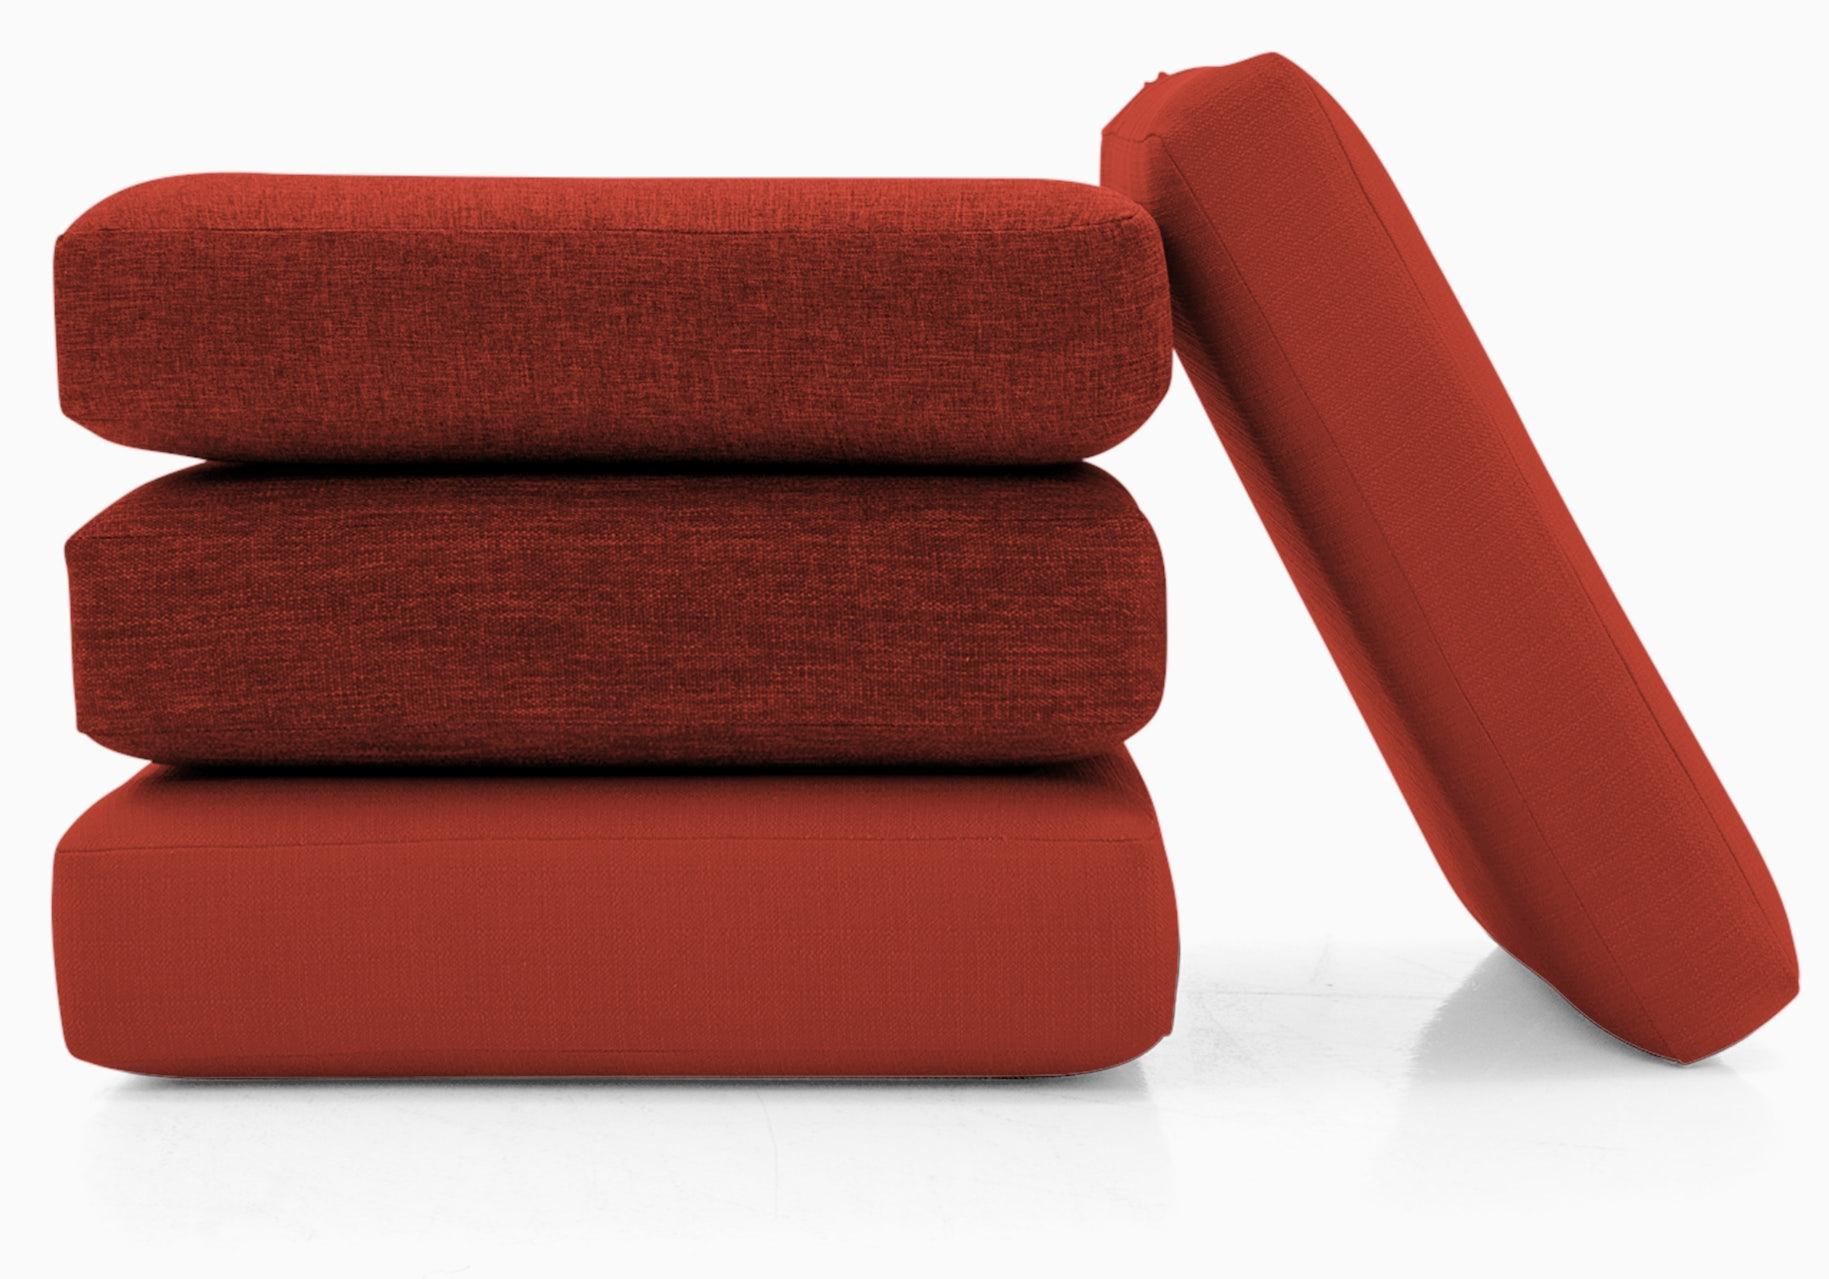 soto cushions and covers %28set%29 cordova picante